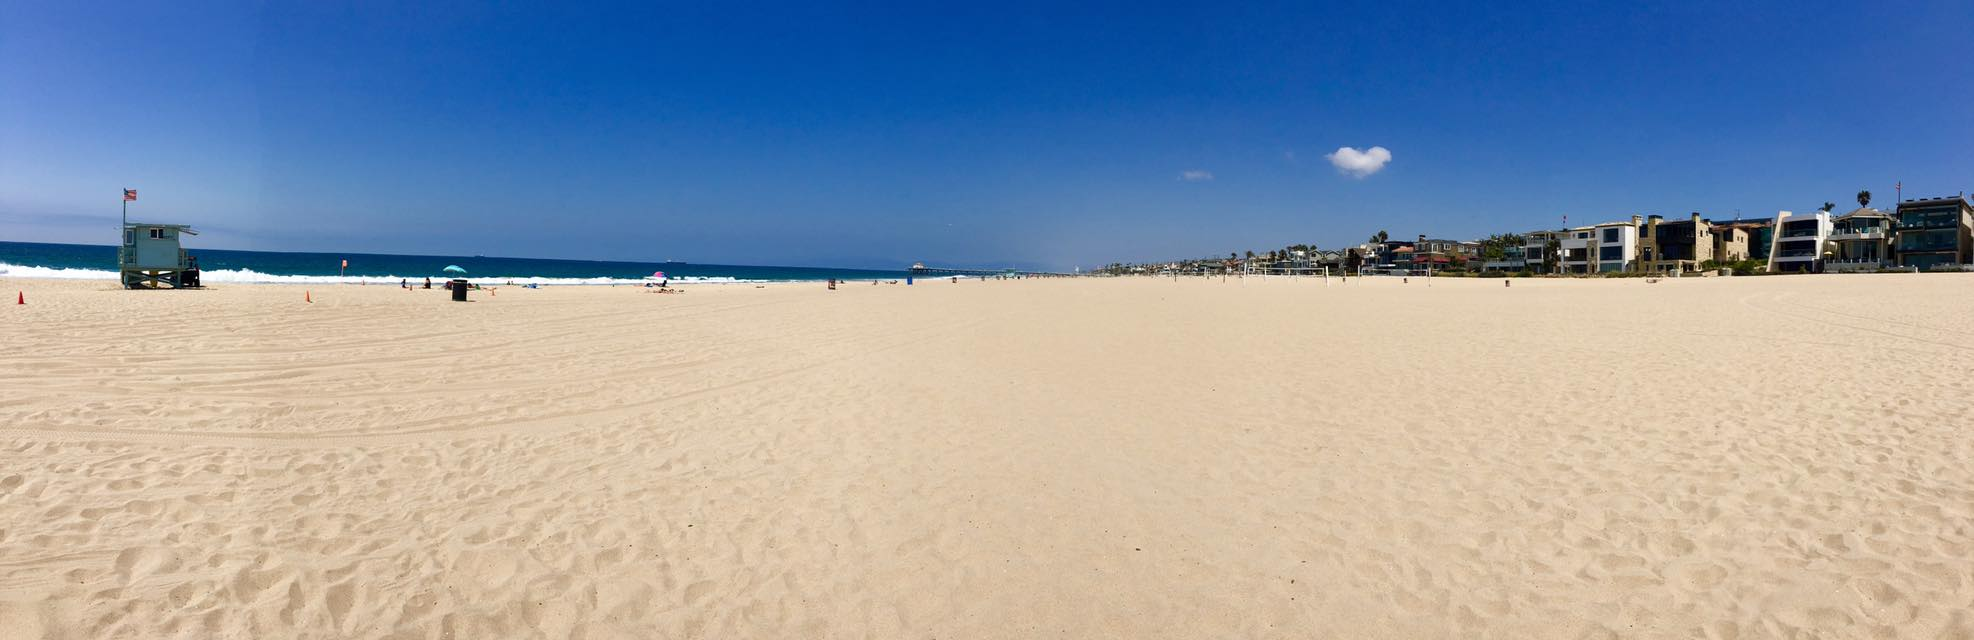 strand in Los angeles luxusreise